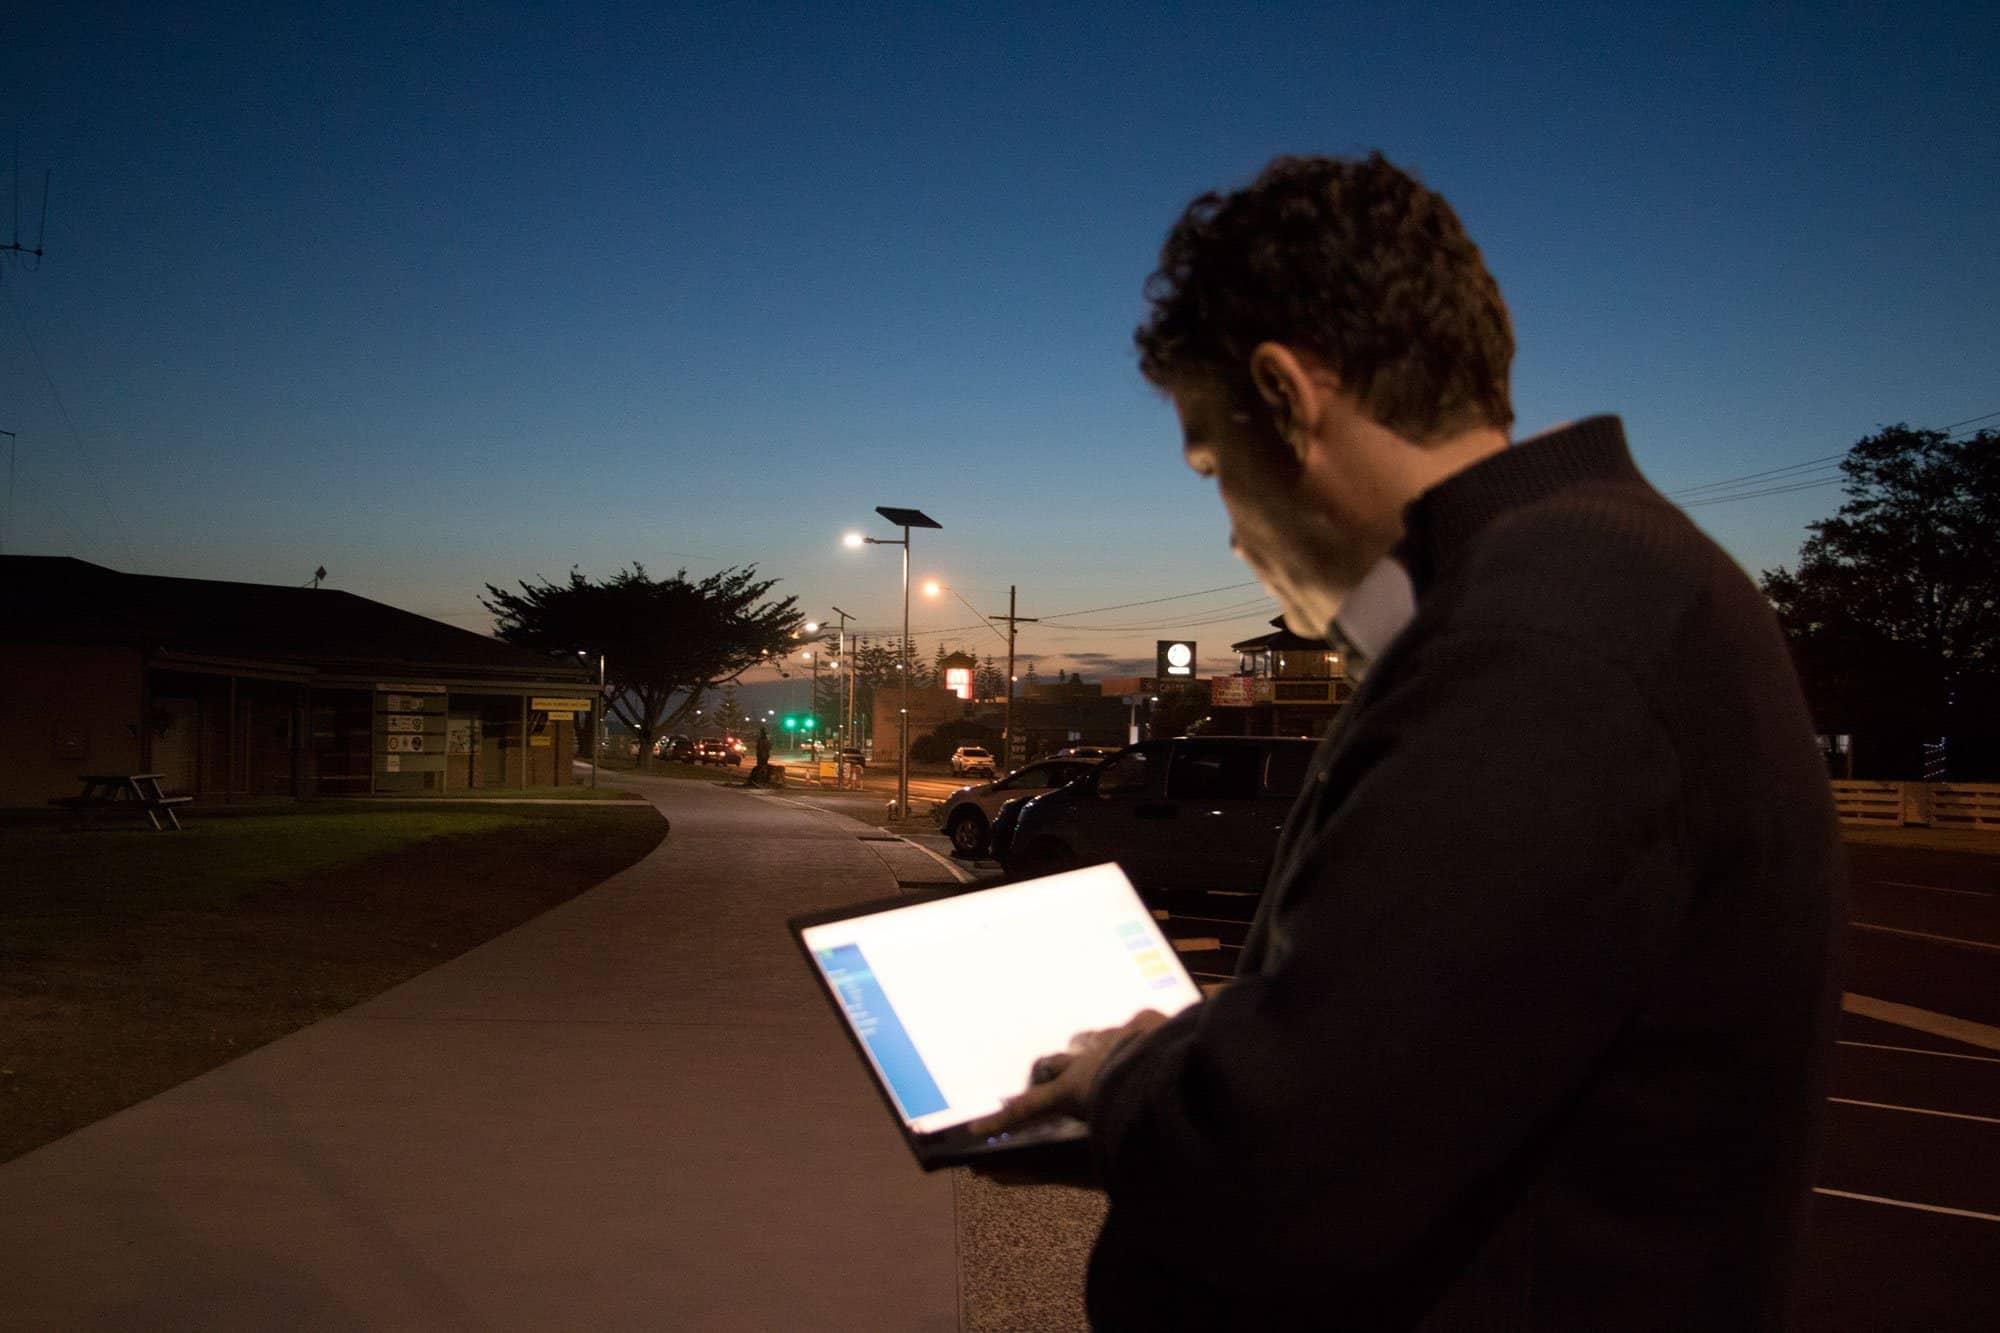 SAM solar activity monitoring control system